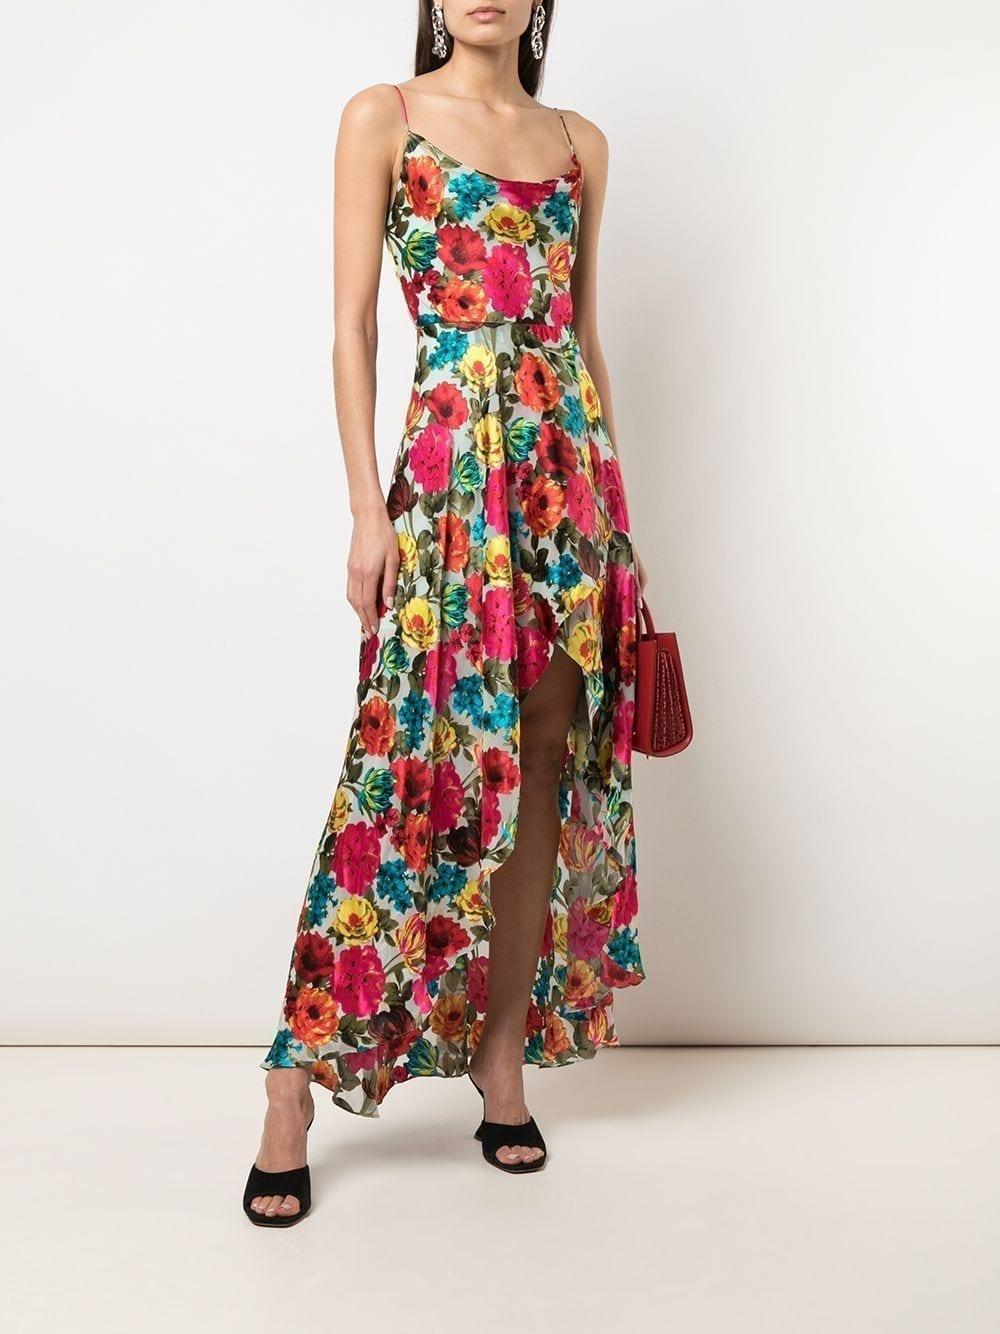 ALICE+OLIVIA Christina Floral Asymmetric Dress